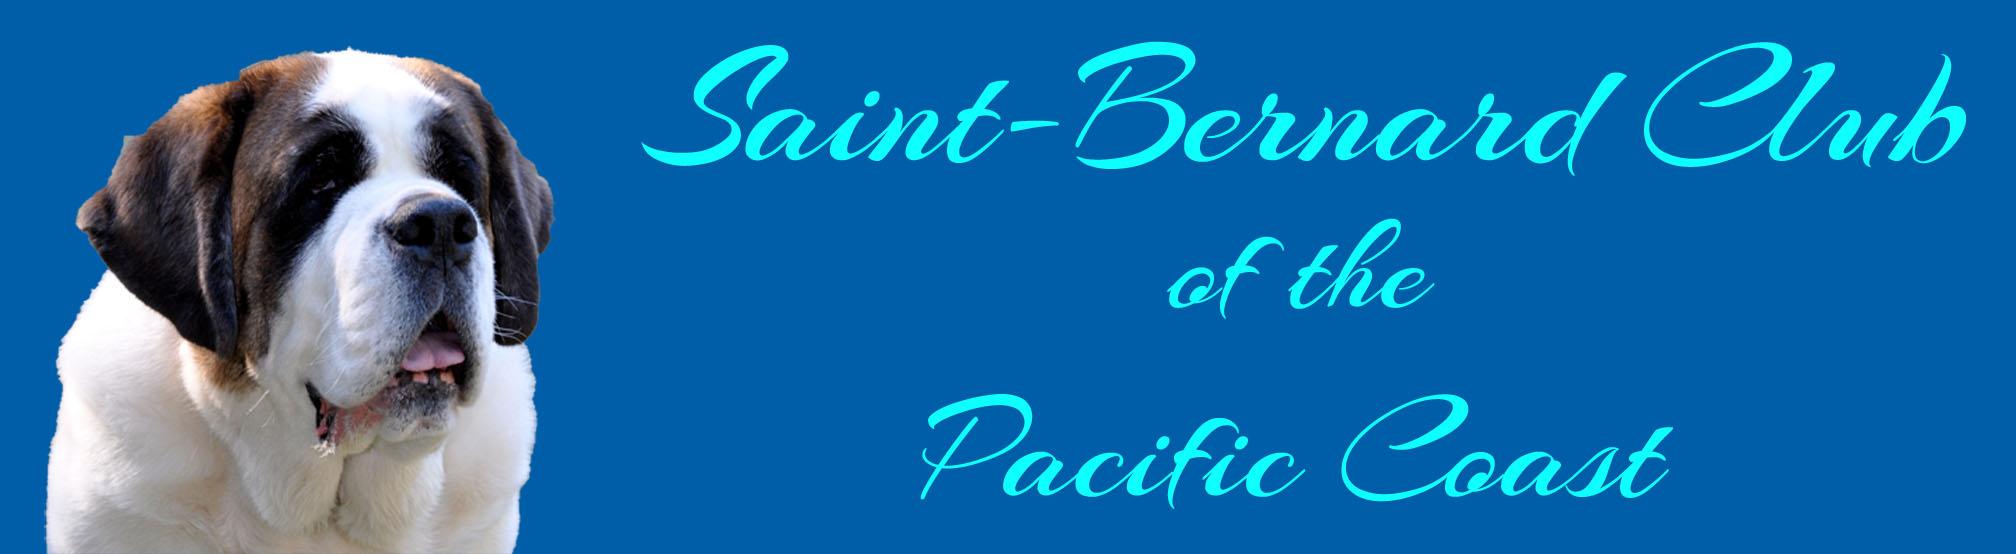 saint-bernardclub.org